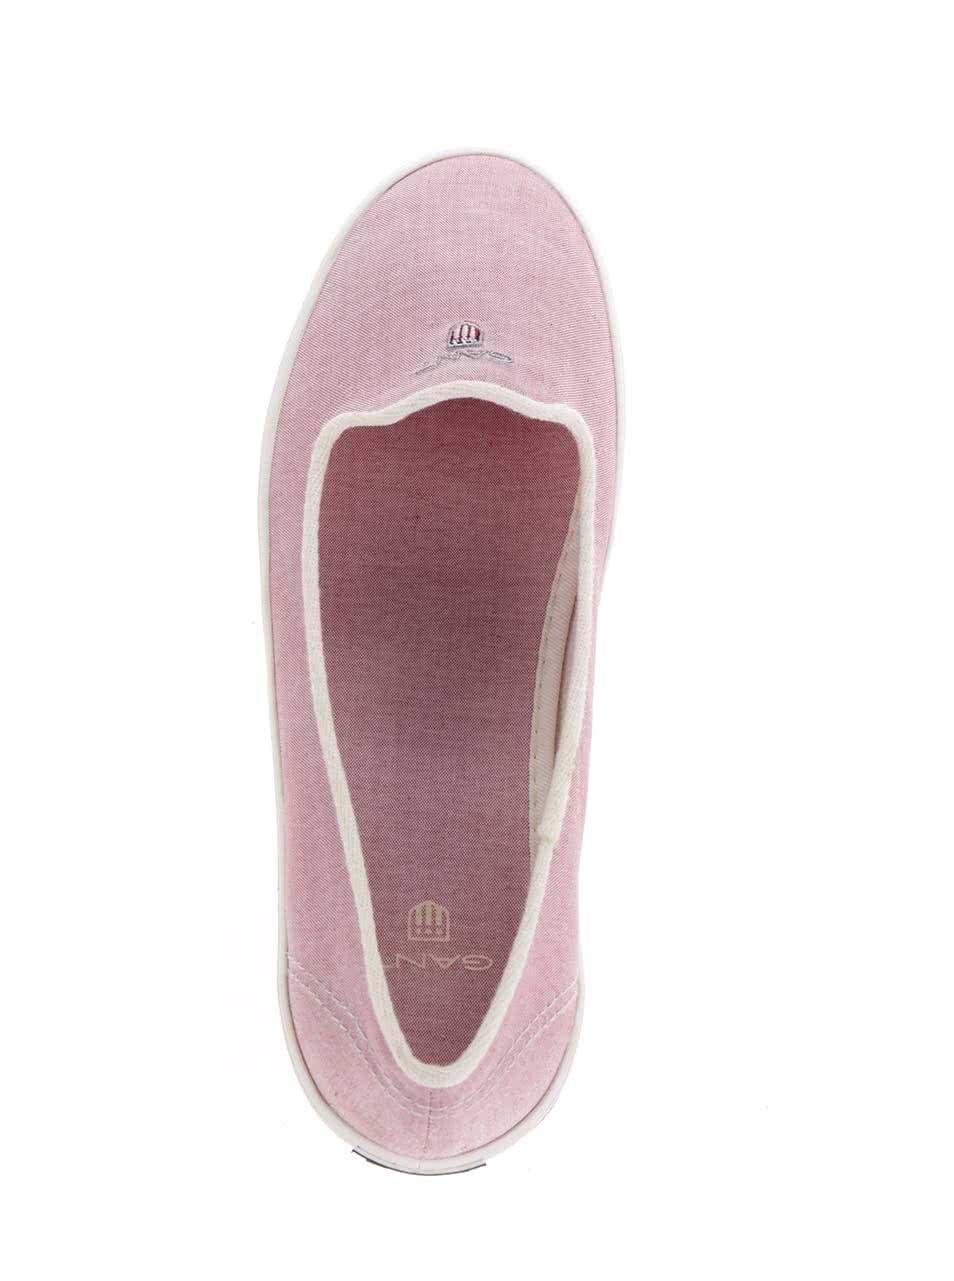 64c4d5b15f Ružové plátené baleríny GANT New Haven ...